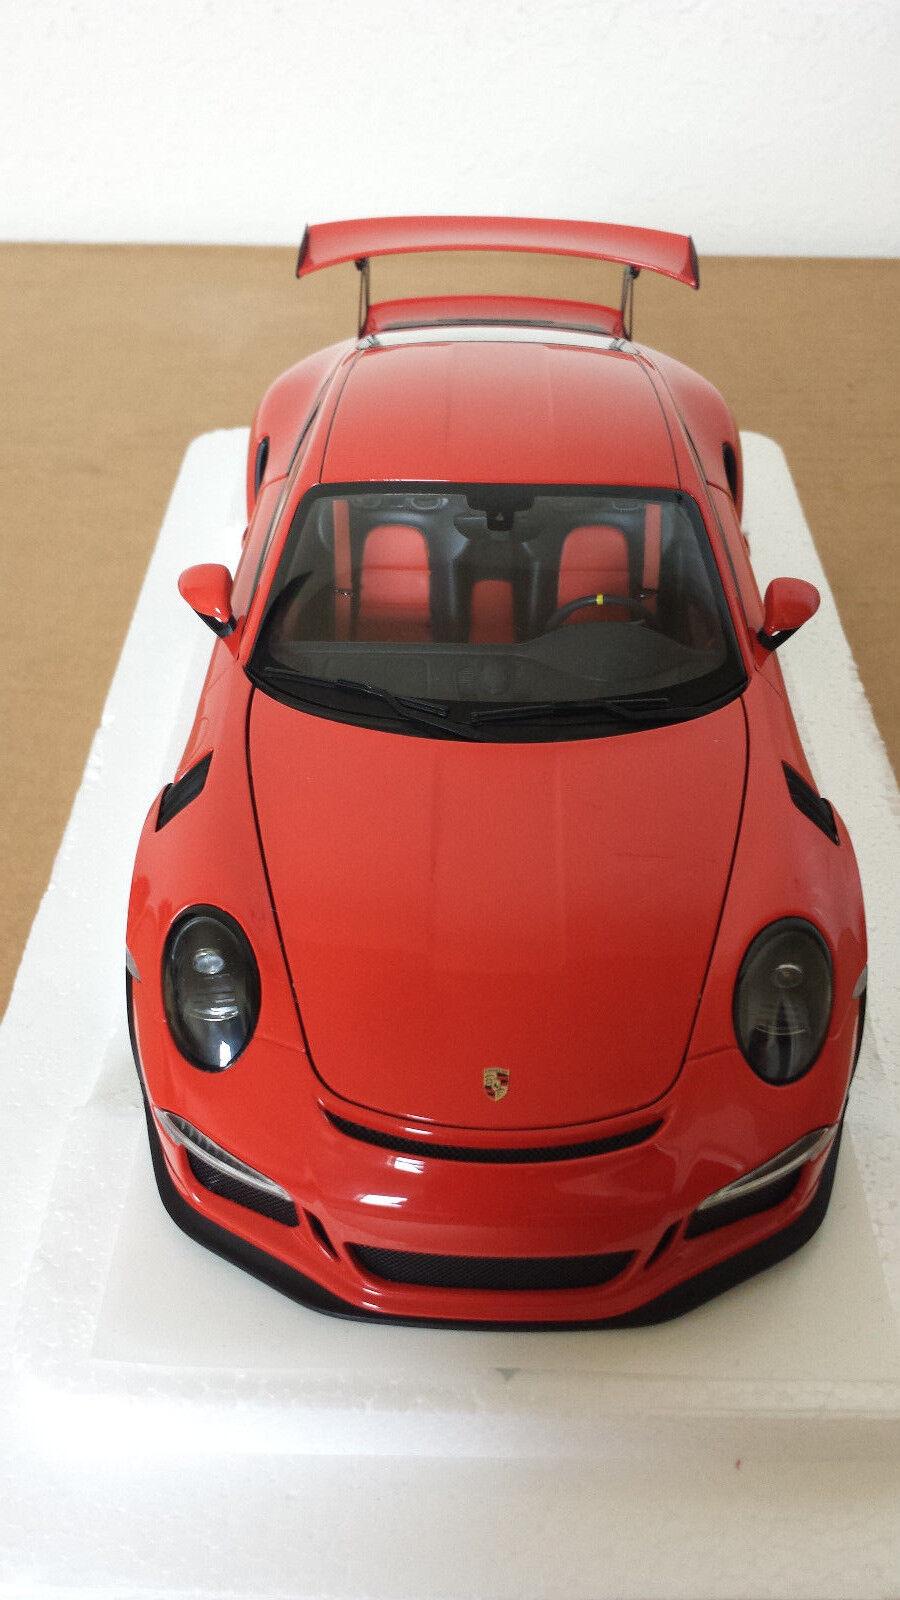 Autoart 78168 Porsche 911 991 GT3 RS 1 18 Lava Naranja Con Ruedas gris oscuro